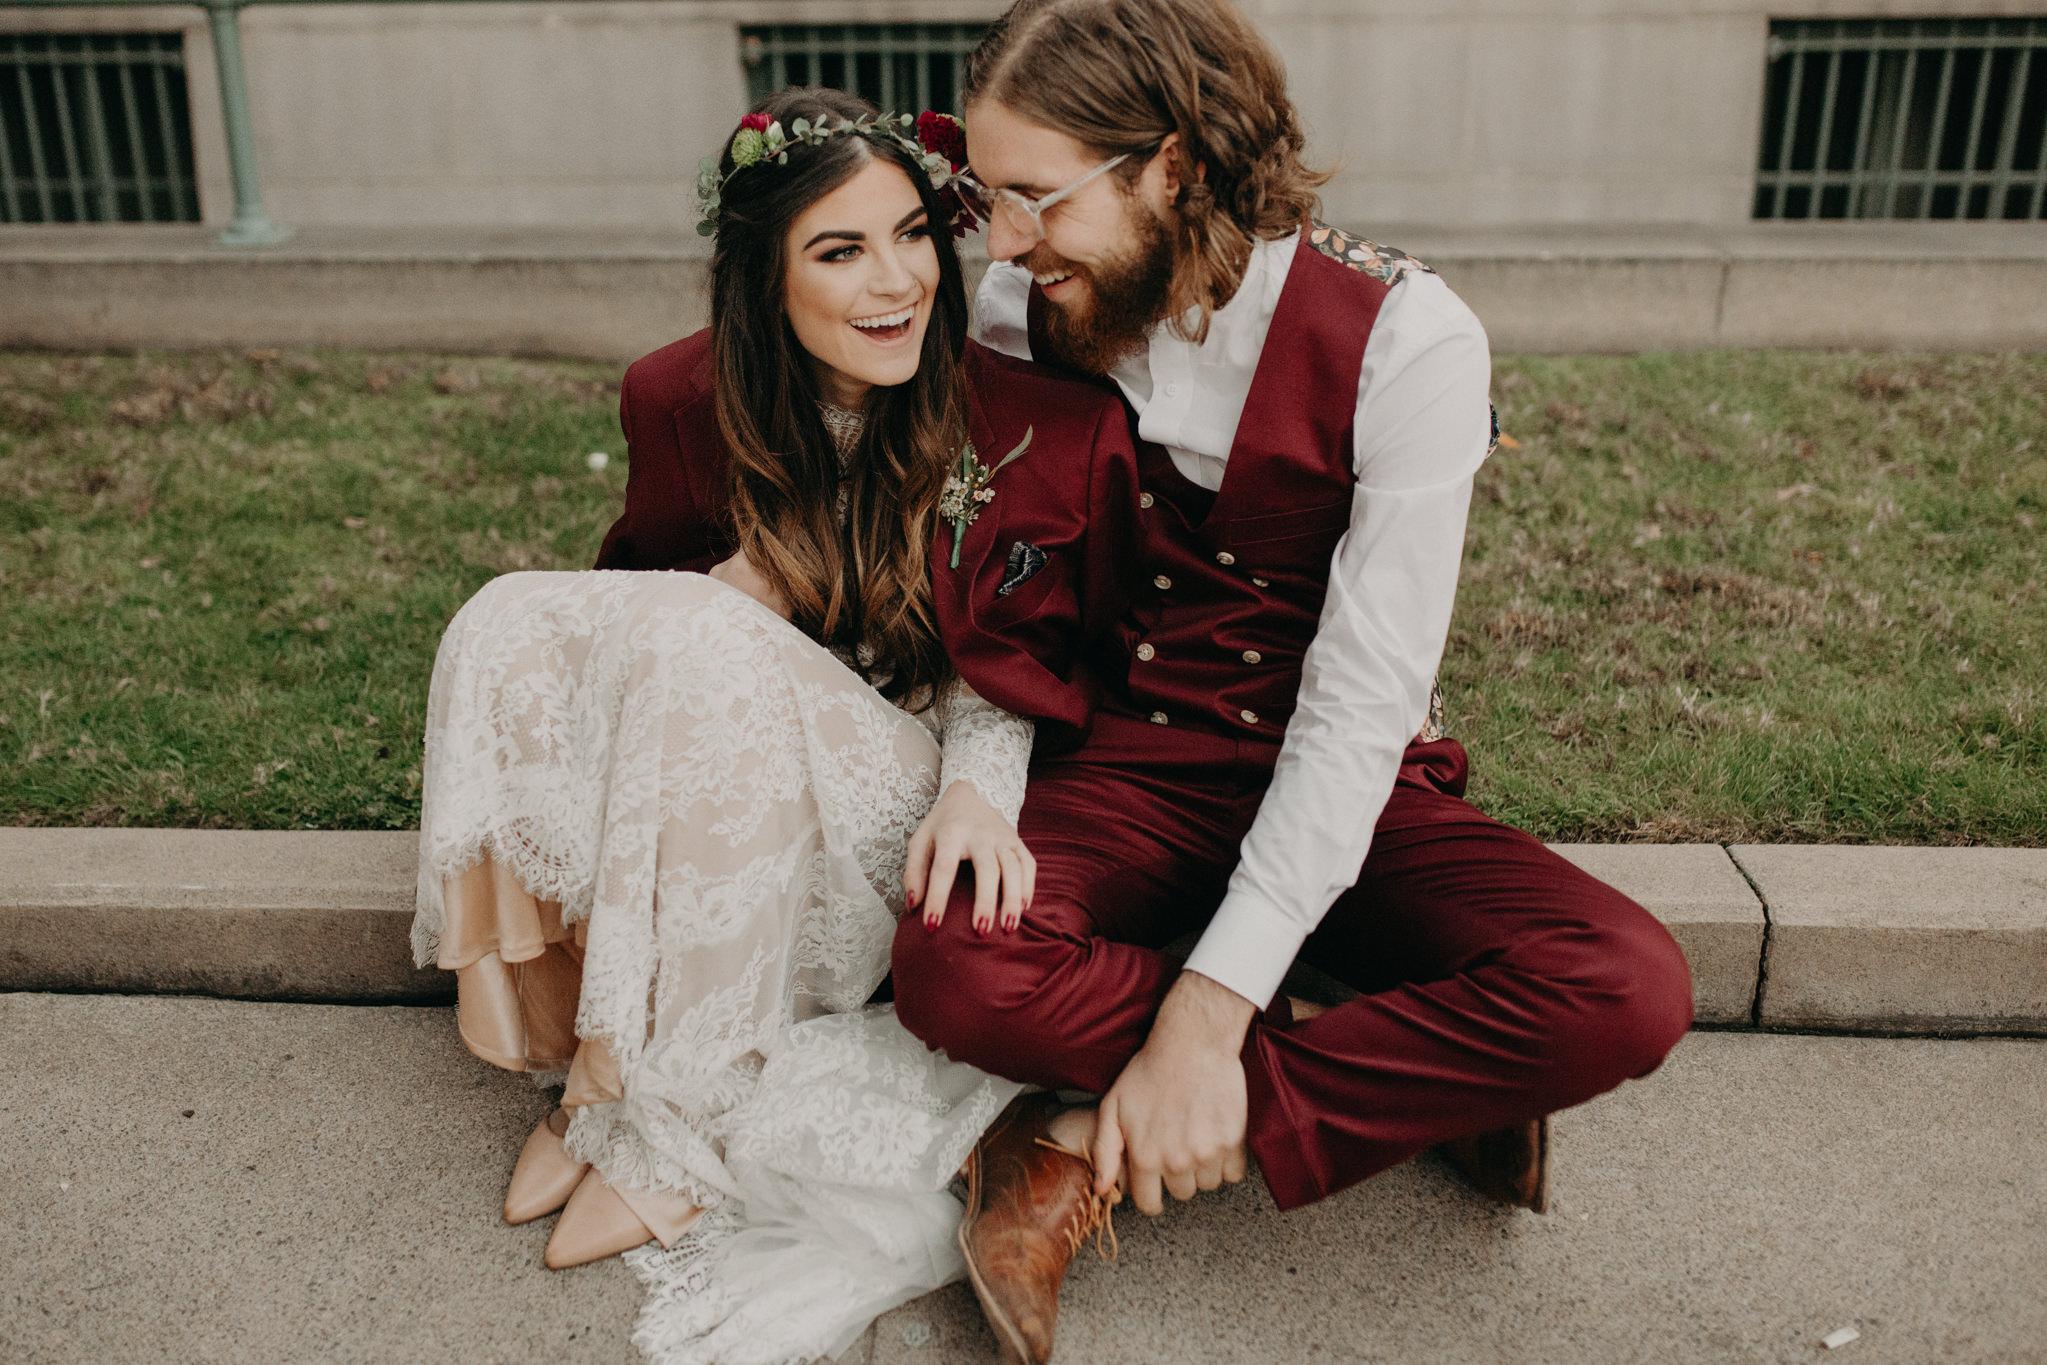 couple-wedding-indie-wedding-northern-california-84.jpg